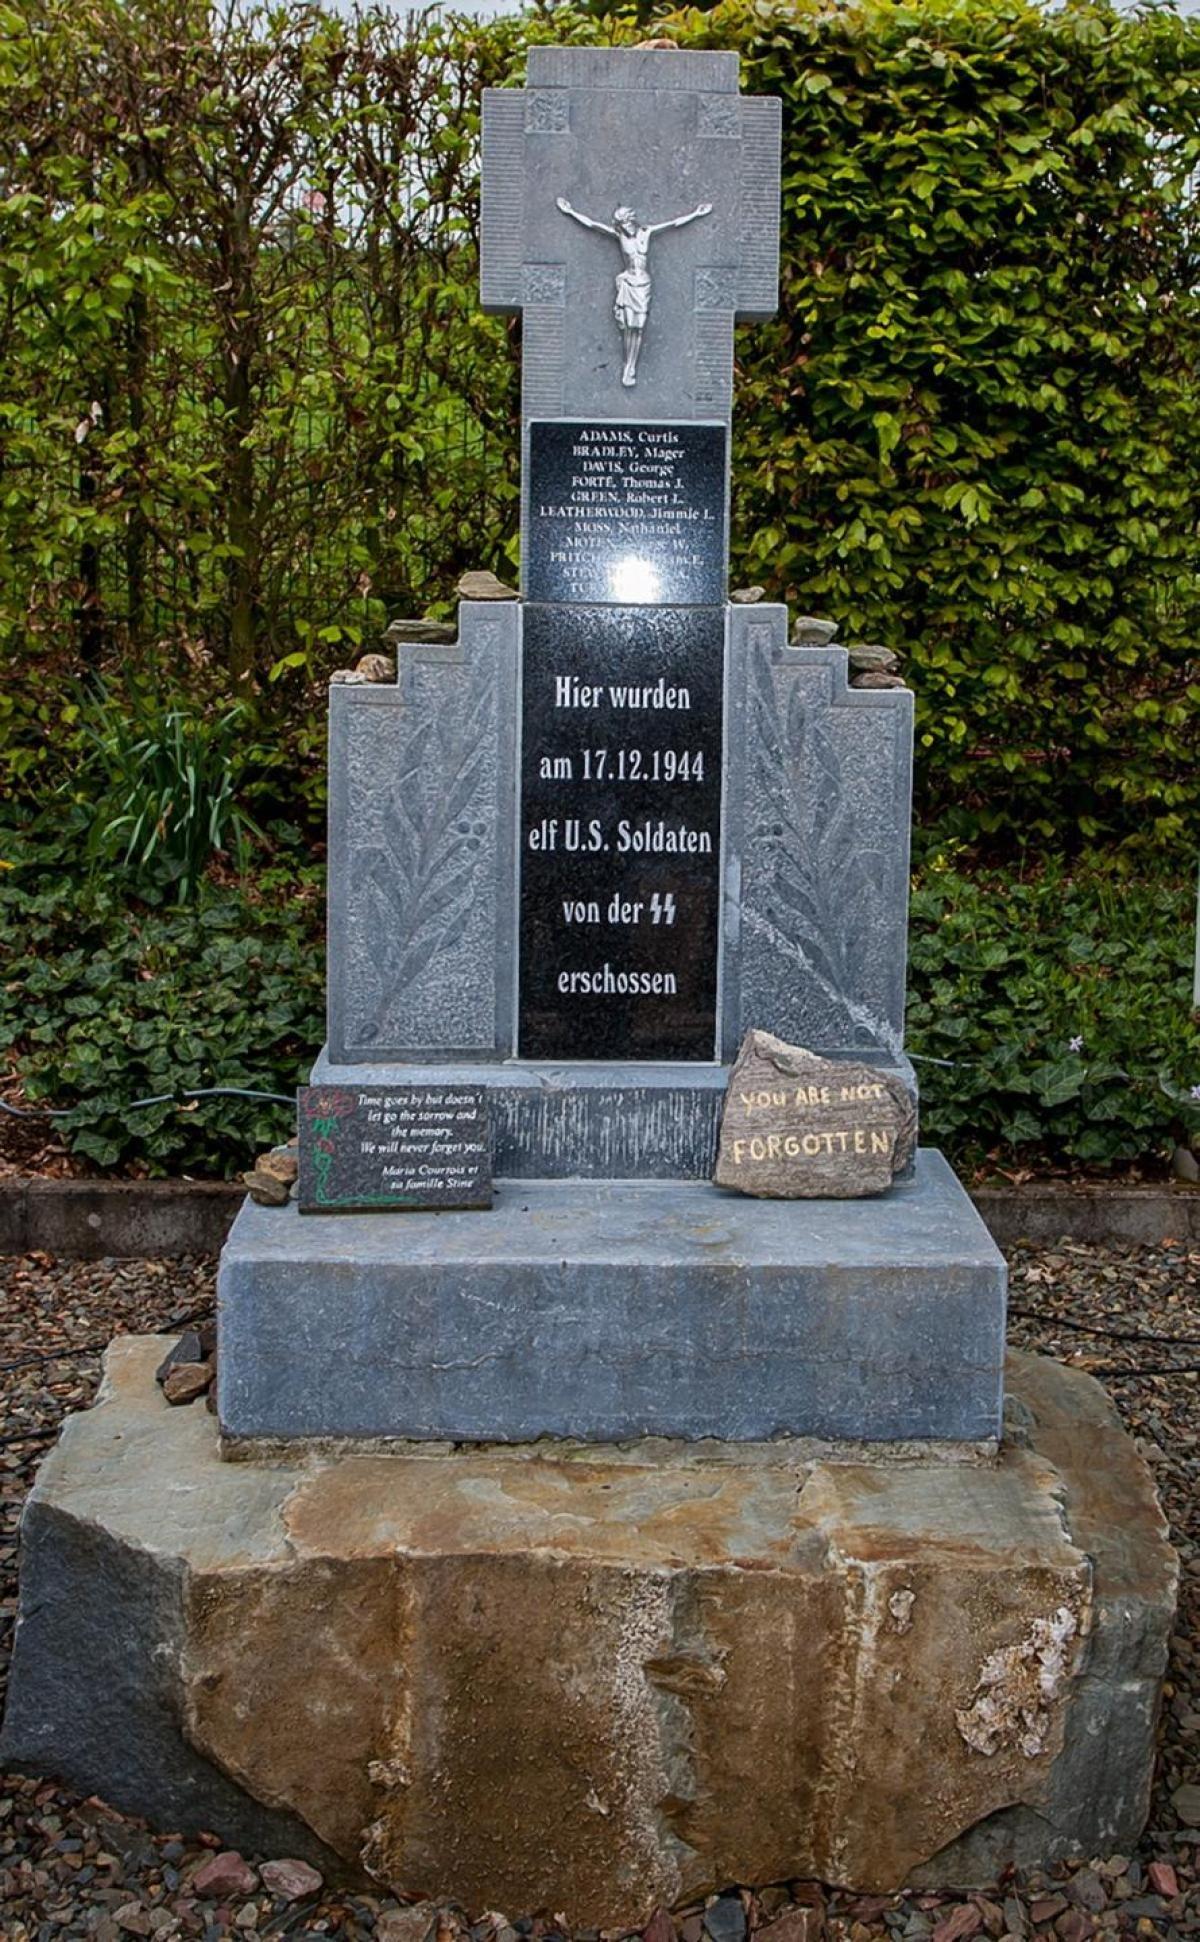 Current memorial in Wereth, Belgium dedicated to Aubrey Stewart and the Wereth 11